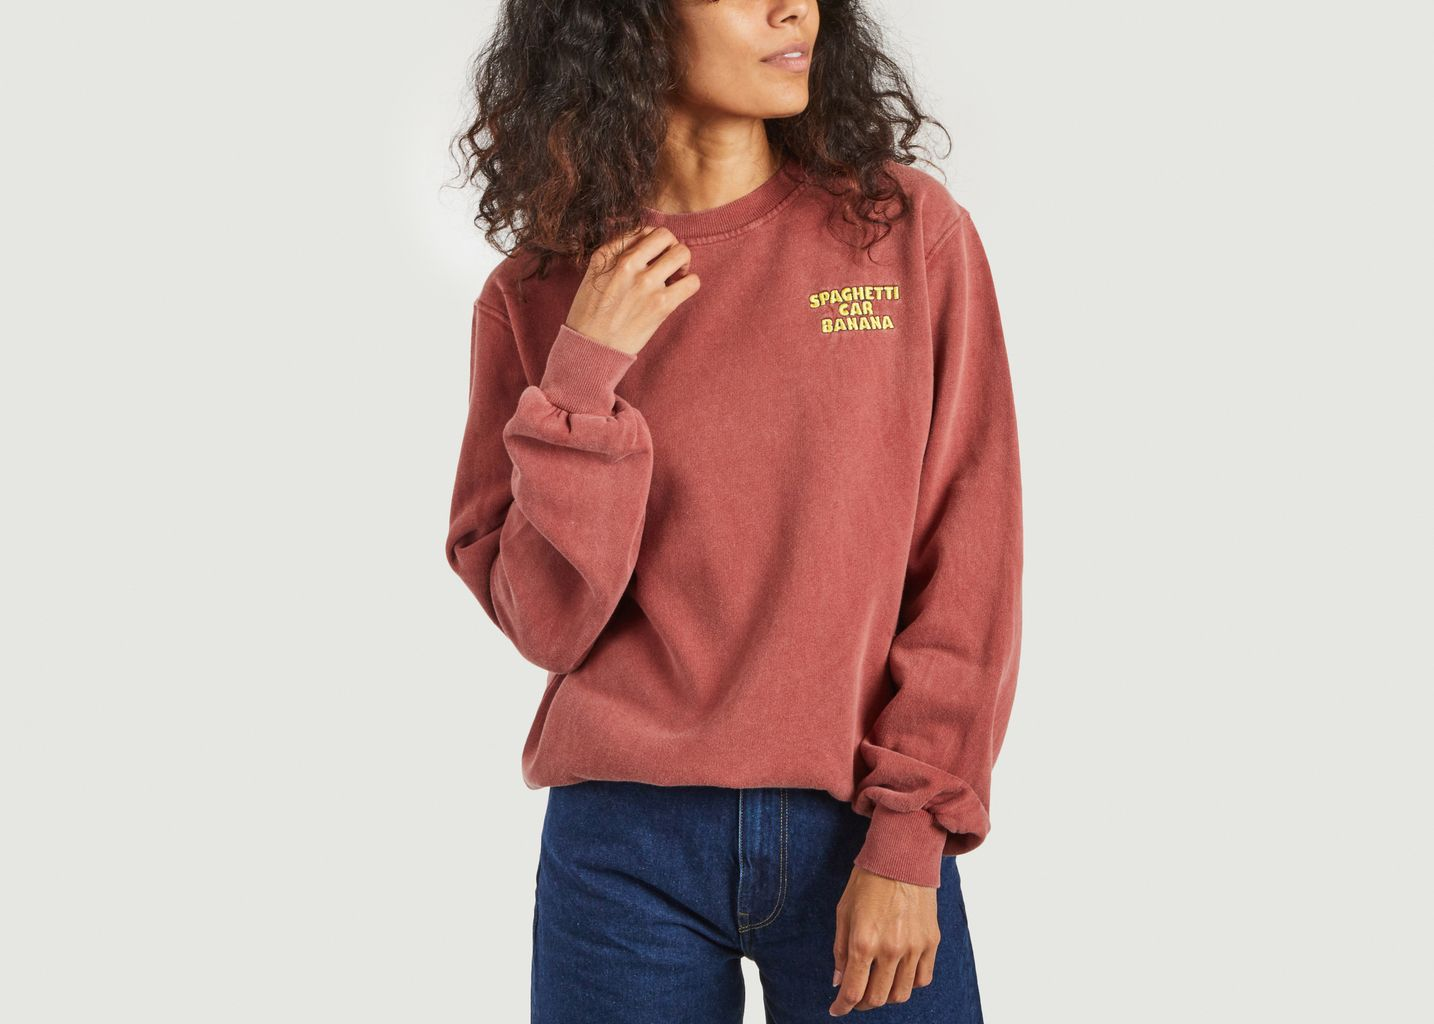 Sweatshirt spaghetti - Bobo Choses